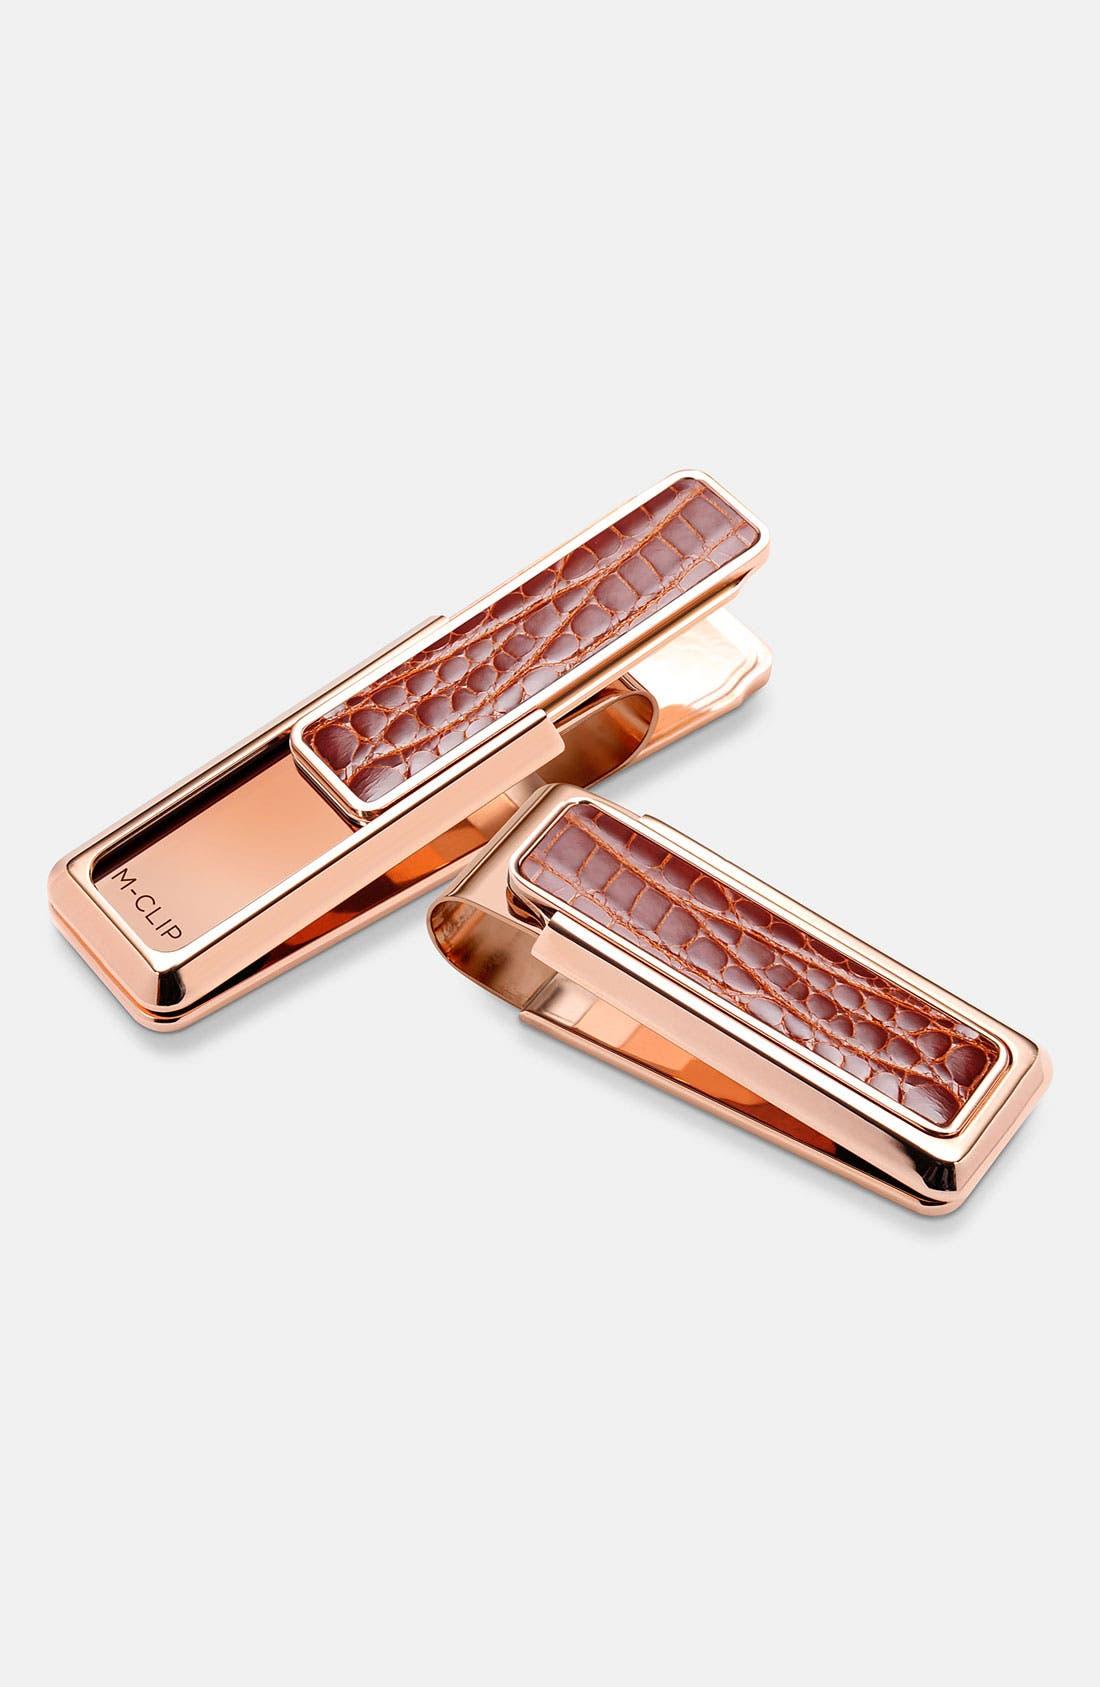 M-CLIP<SUP>®</SUP> 'New Yorker Alligator' Money Clip, Main, color, ROSE GOLD/ COGNAC